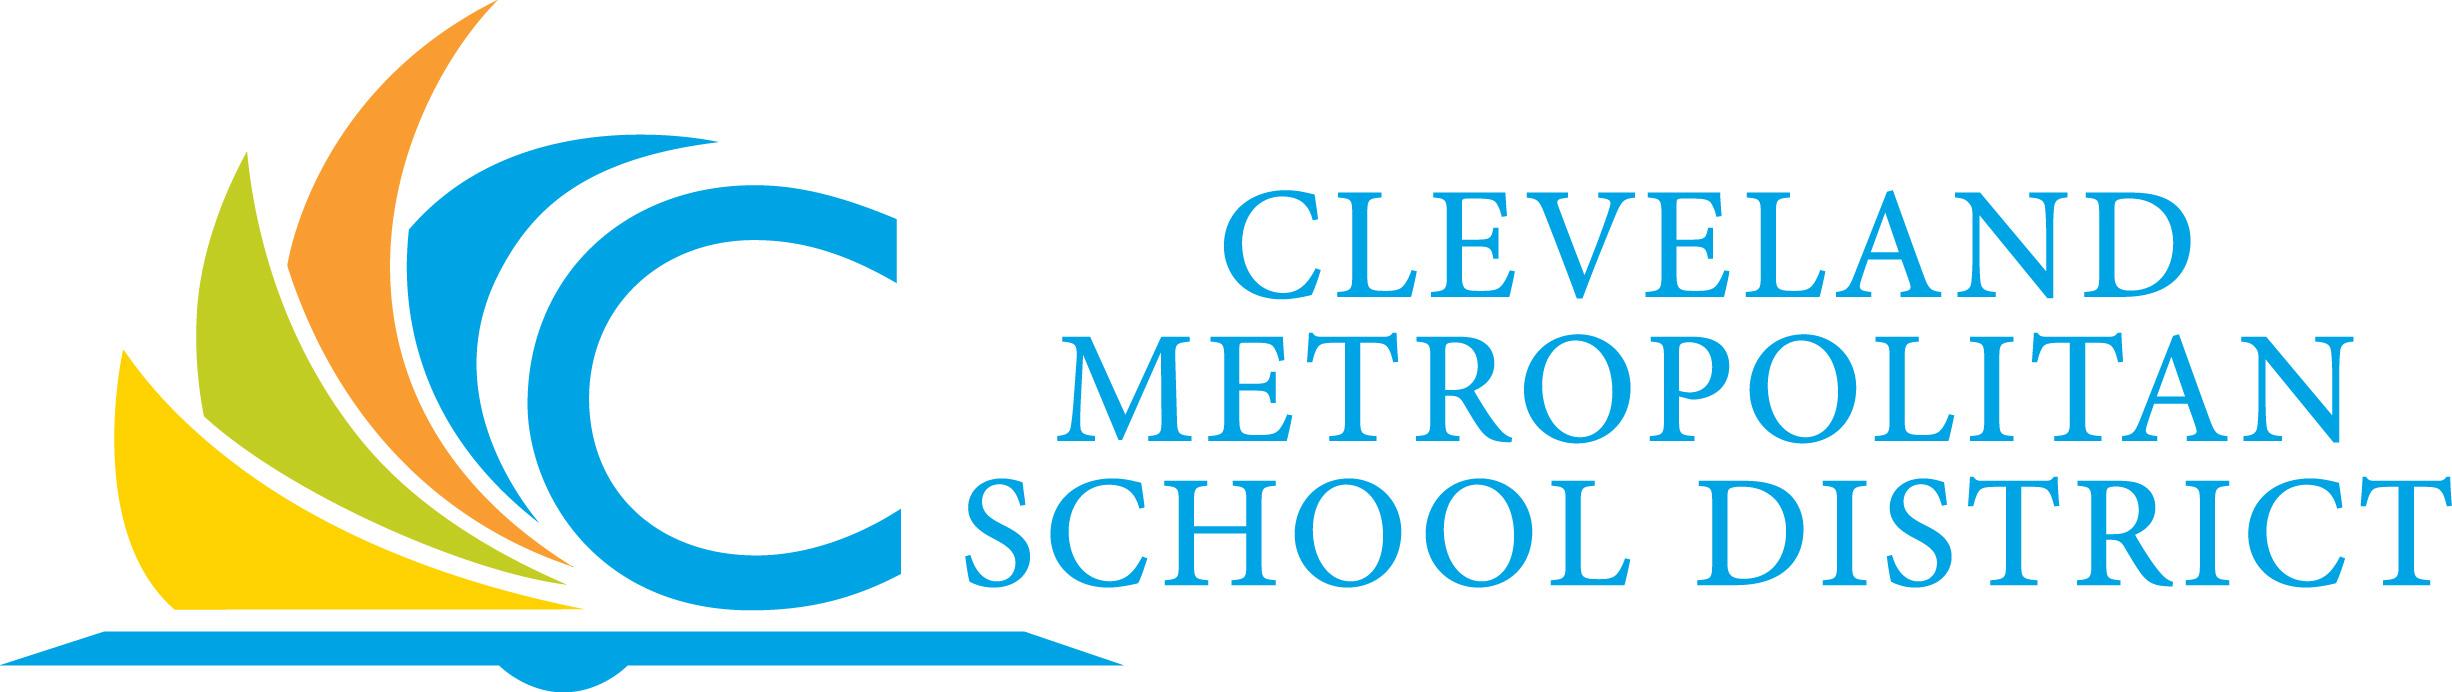 ClevelandMetroSchoolDistrict.jpg